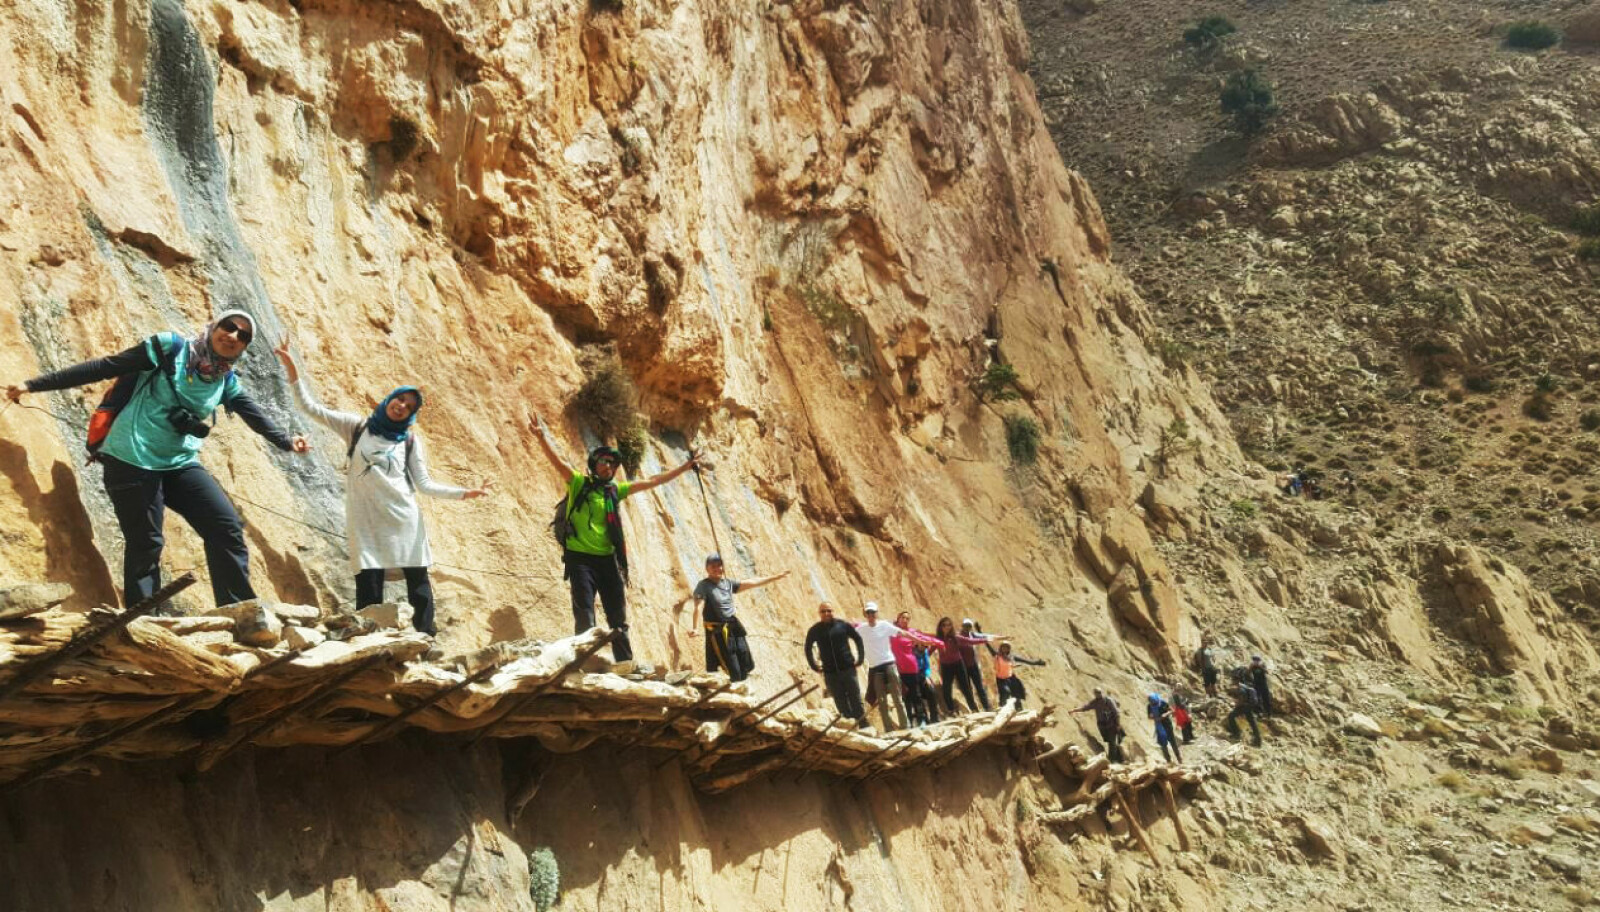 <b>BERBERBROEN:</b> Passage de ponts berberes, en enkel, men luftig passasje i Tahgia i Marokko.